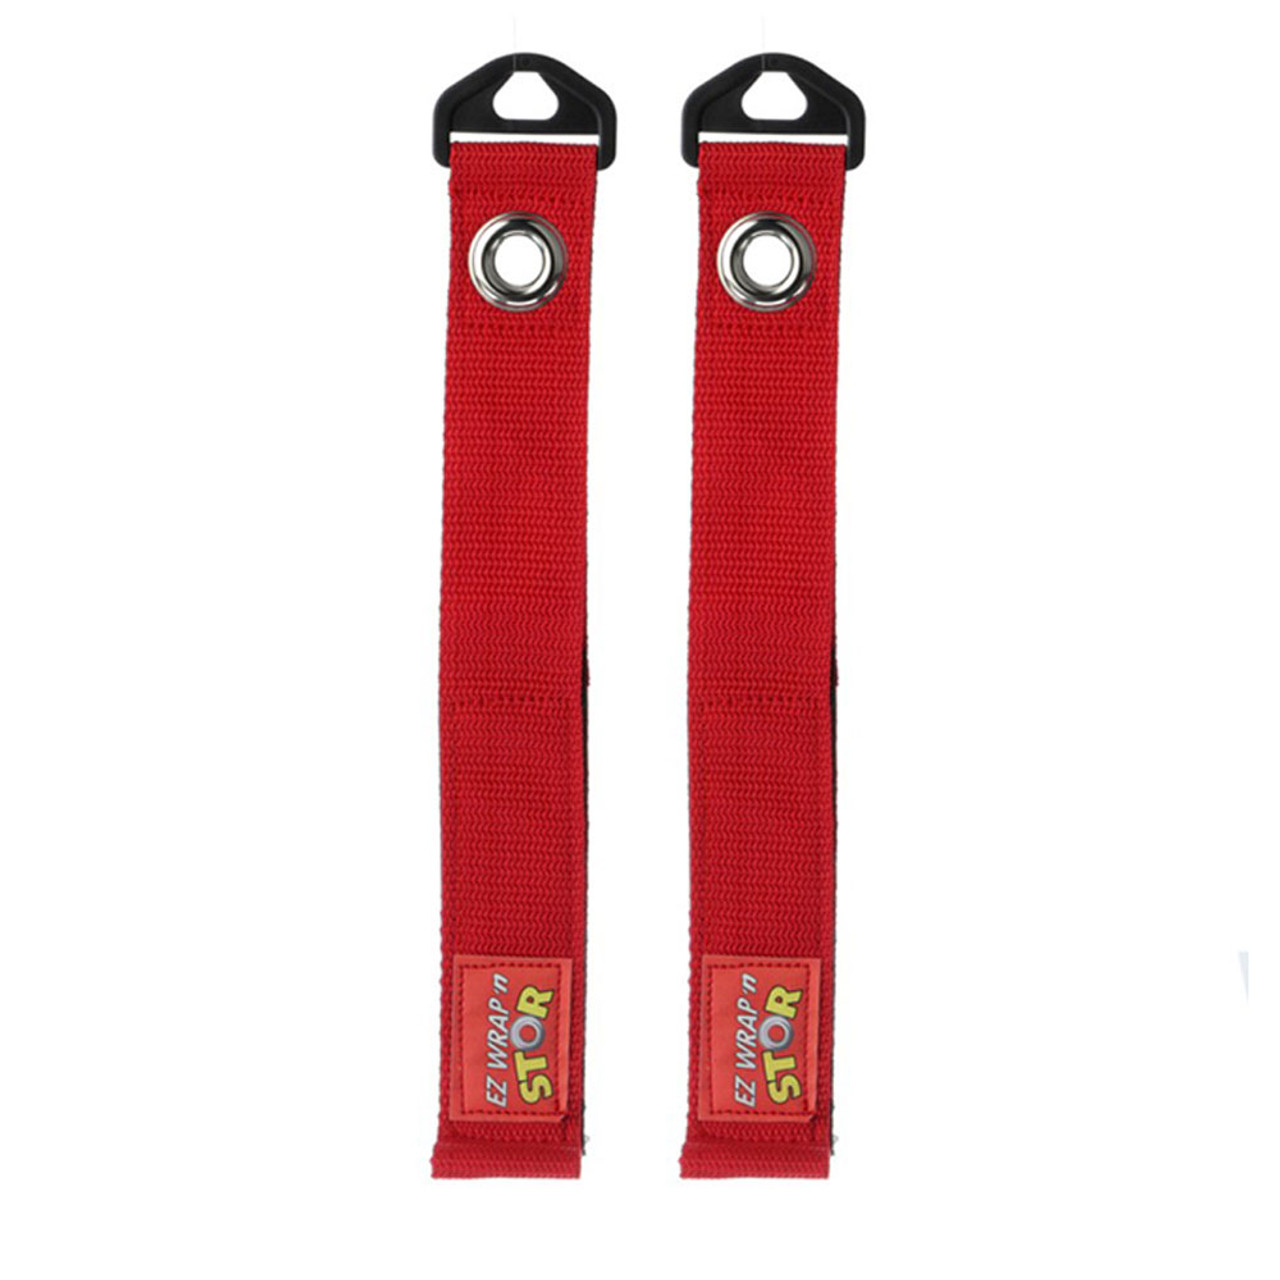 EZ Wrap 'n Stor™ Straps - Long / Velcro Straps - Bundling Straps - Velcro Tie - Velcro Strap